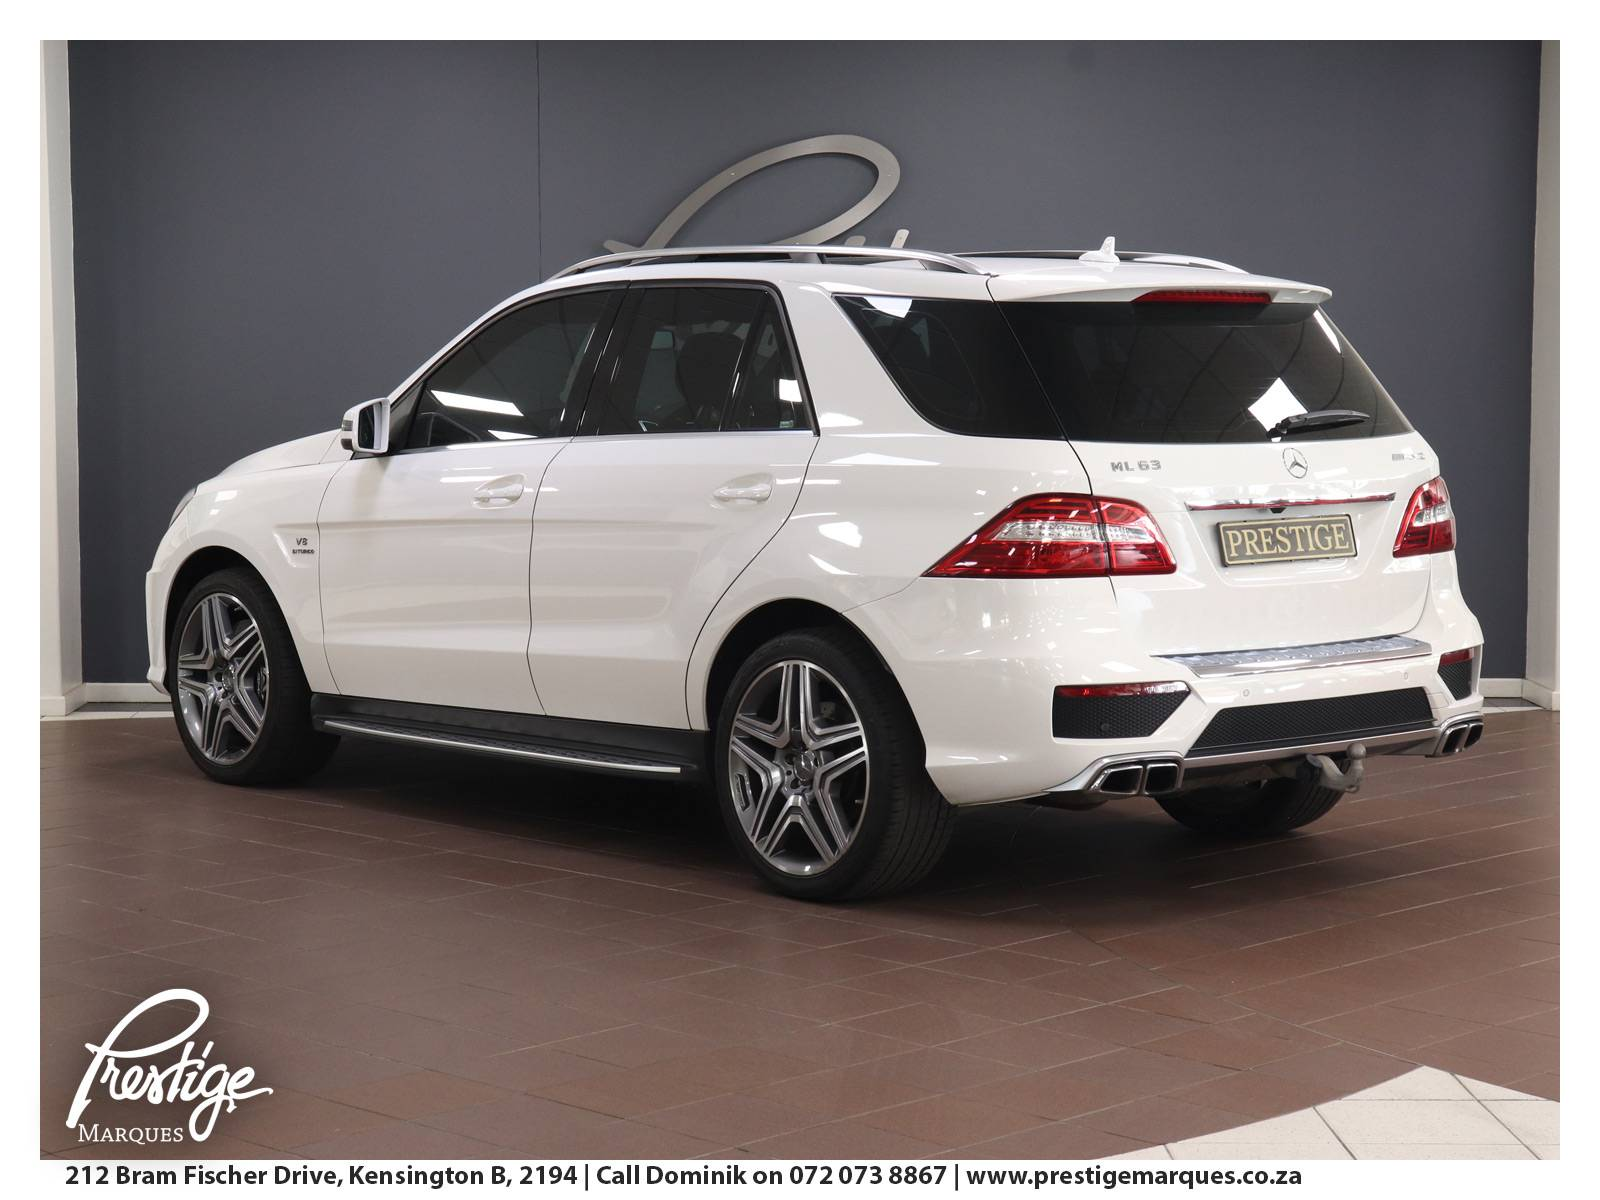 2015-Mercedes-Benz-ML63-AMG-Prestige-Marques-Randburg-Sandton-4